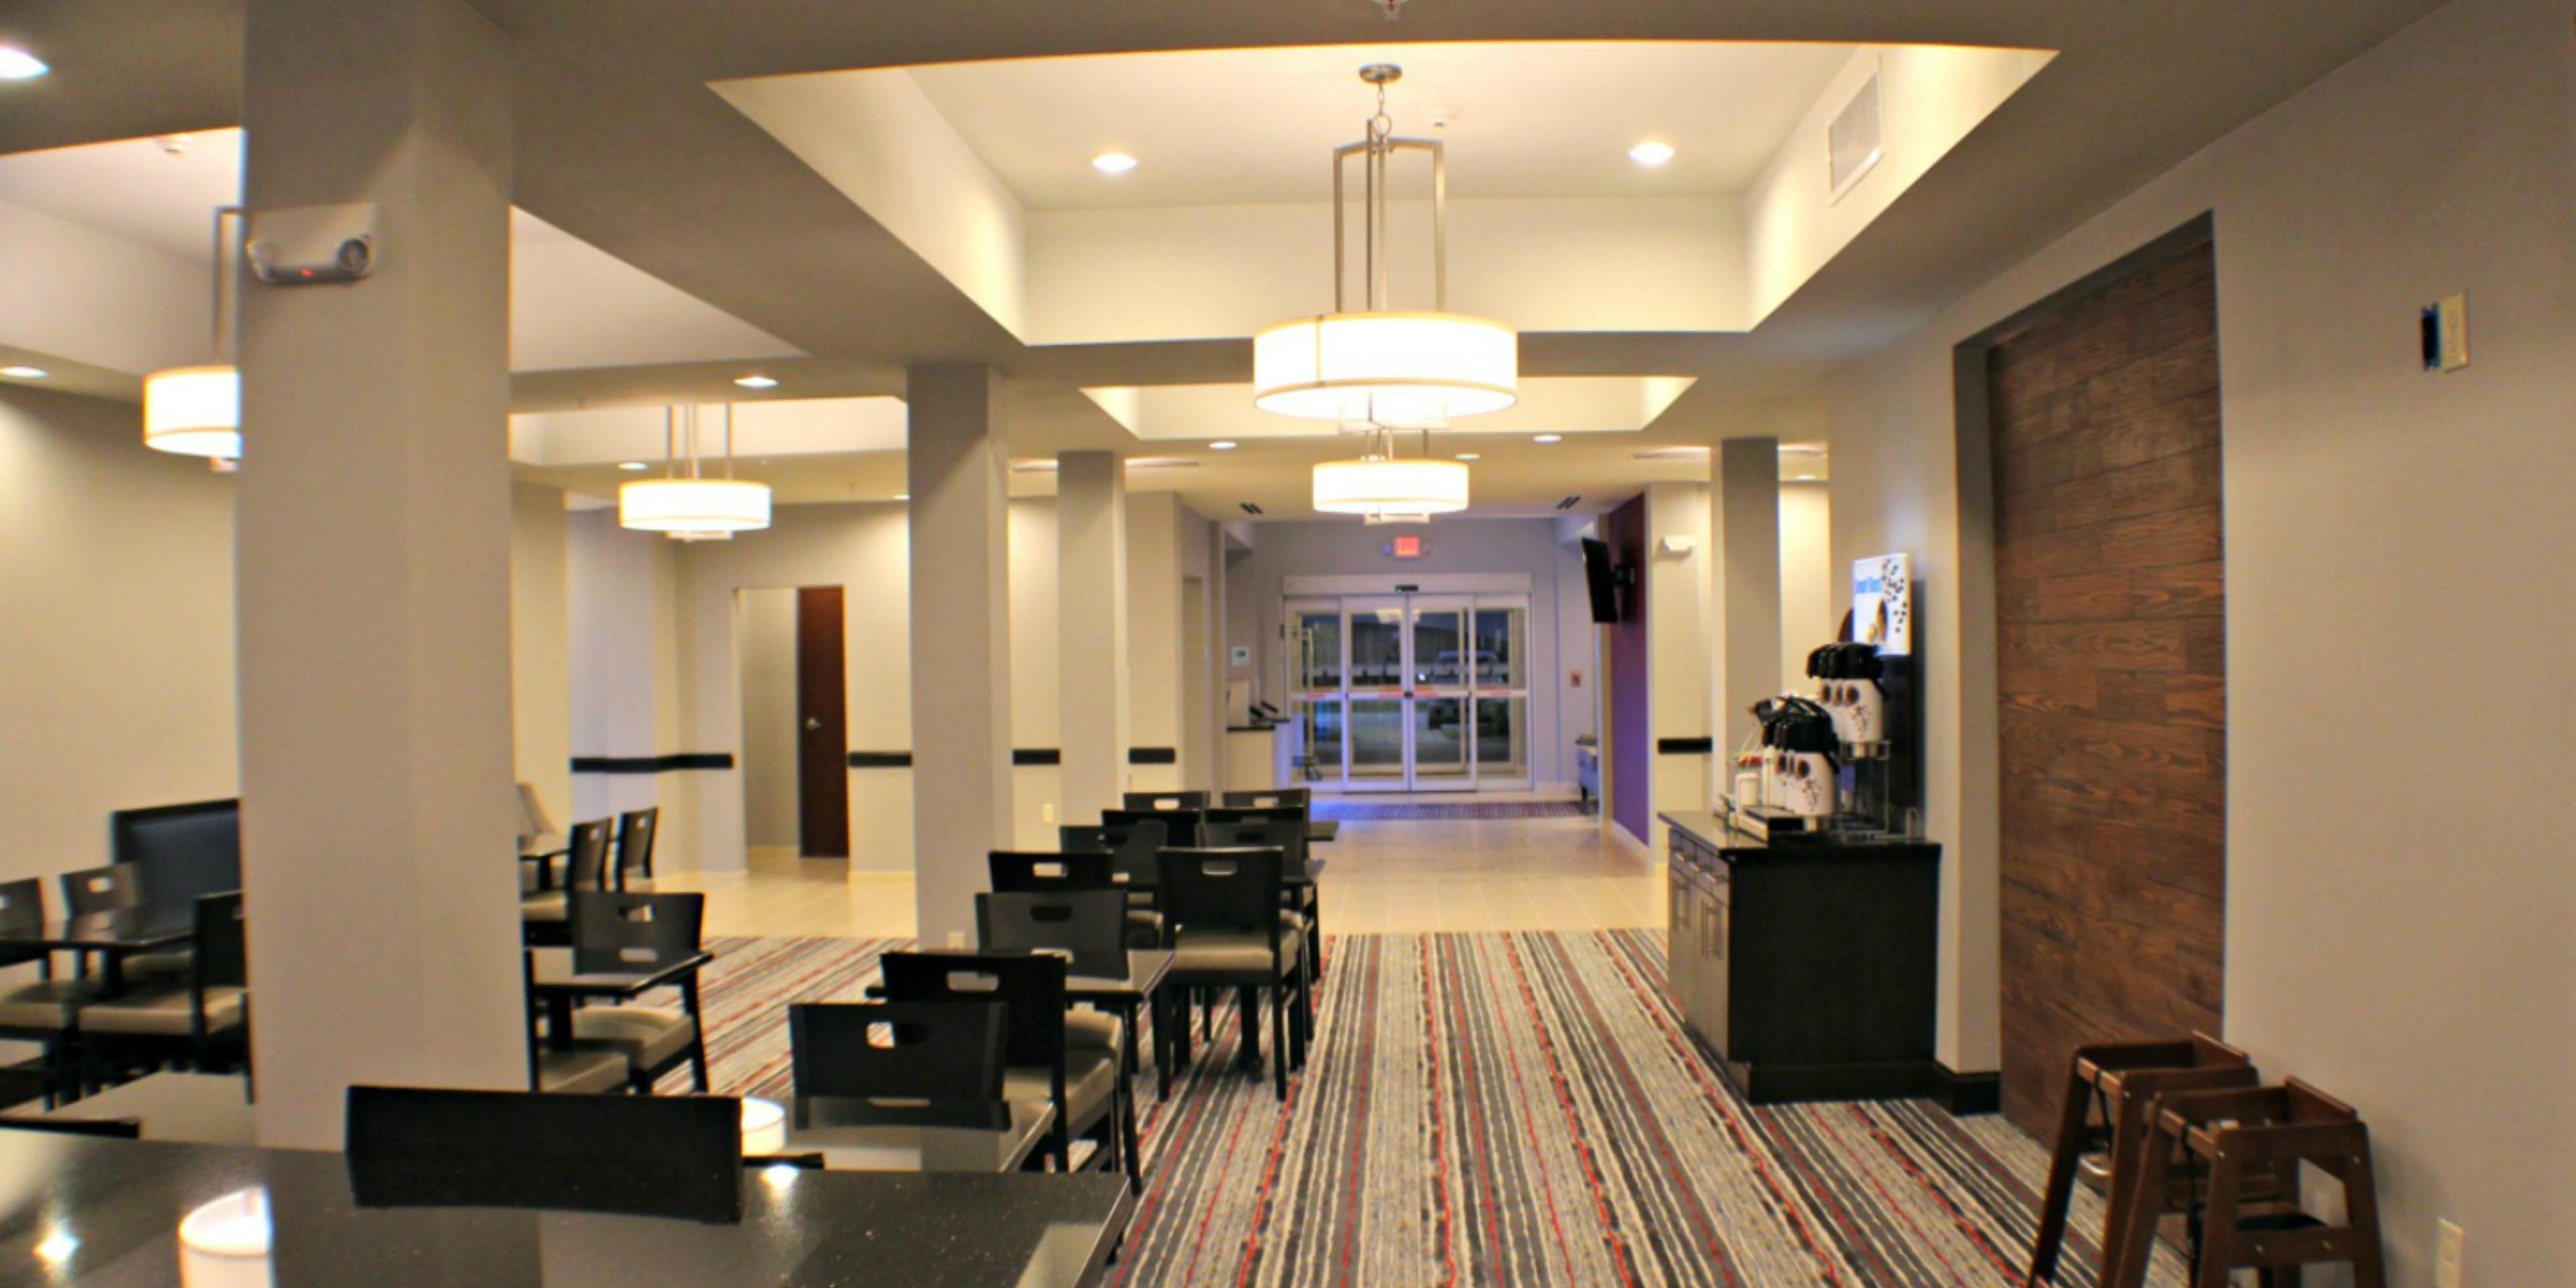 Holiday Inn Express And Suites Bonham 4367255461 2x1